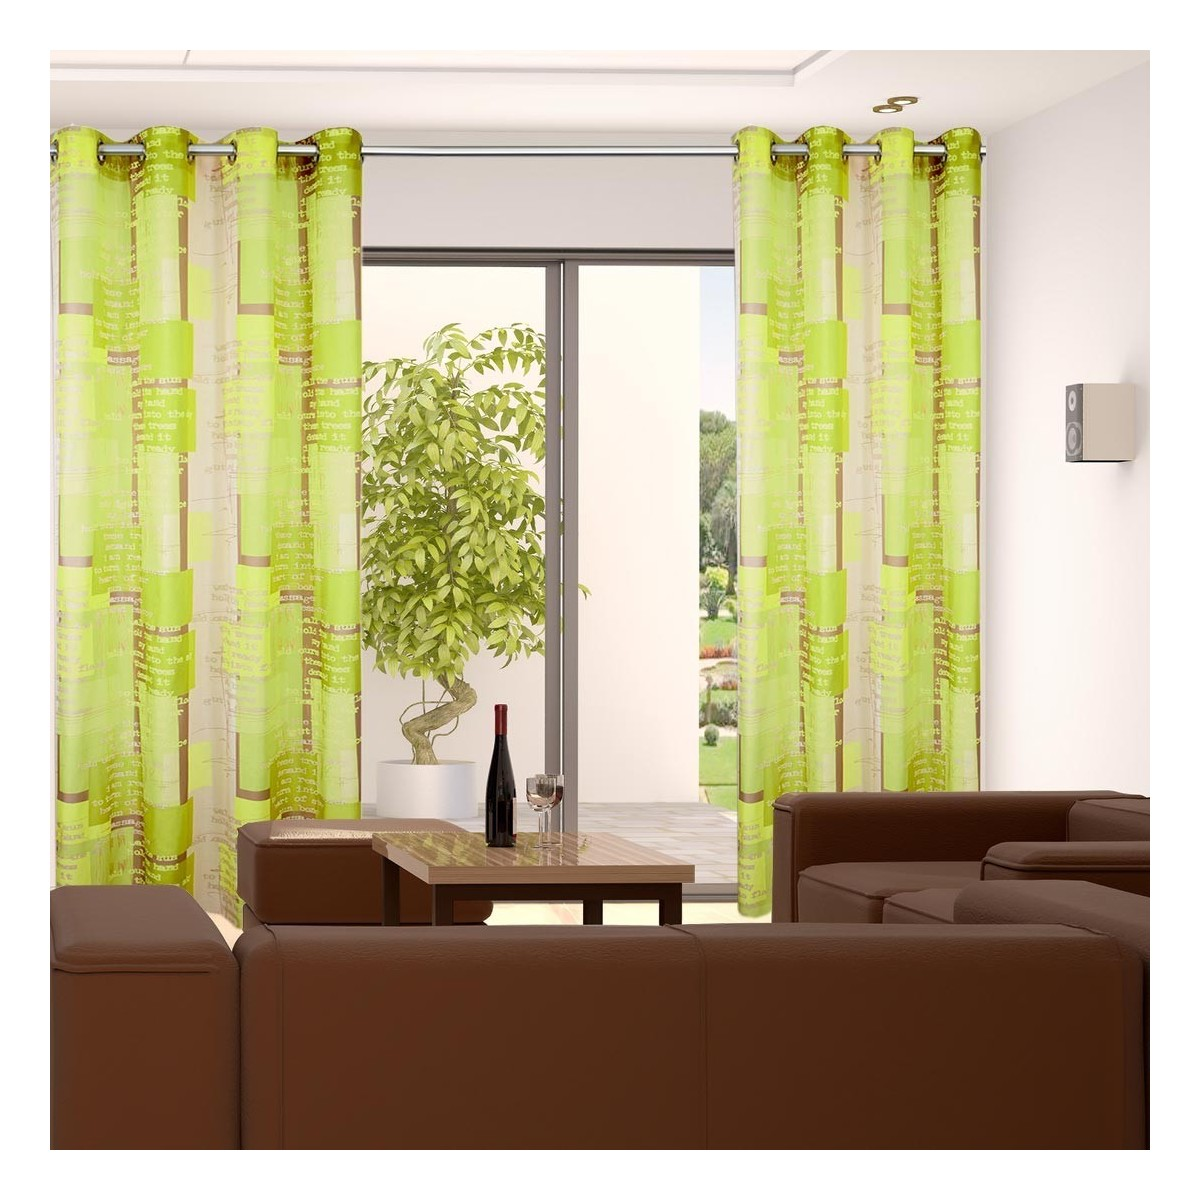 "Ösenschal ""Coventry"" Vorhang Dekoschal 8 Ösen | grün | Höhe kürzbar nach Wunsch"